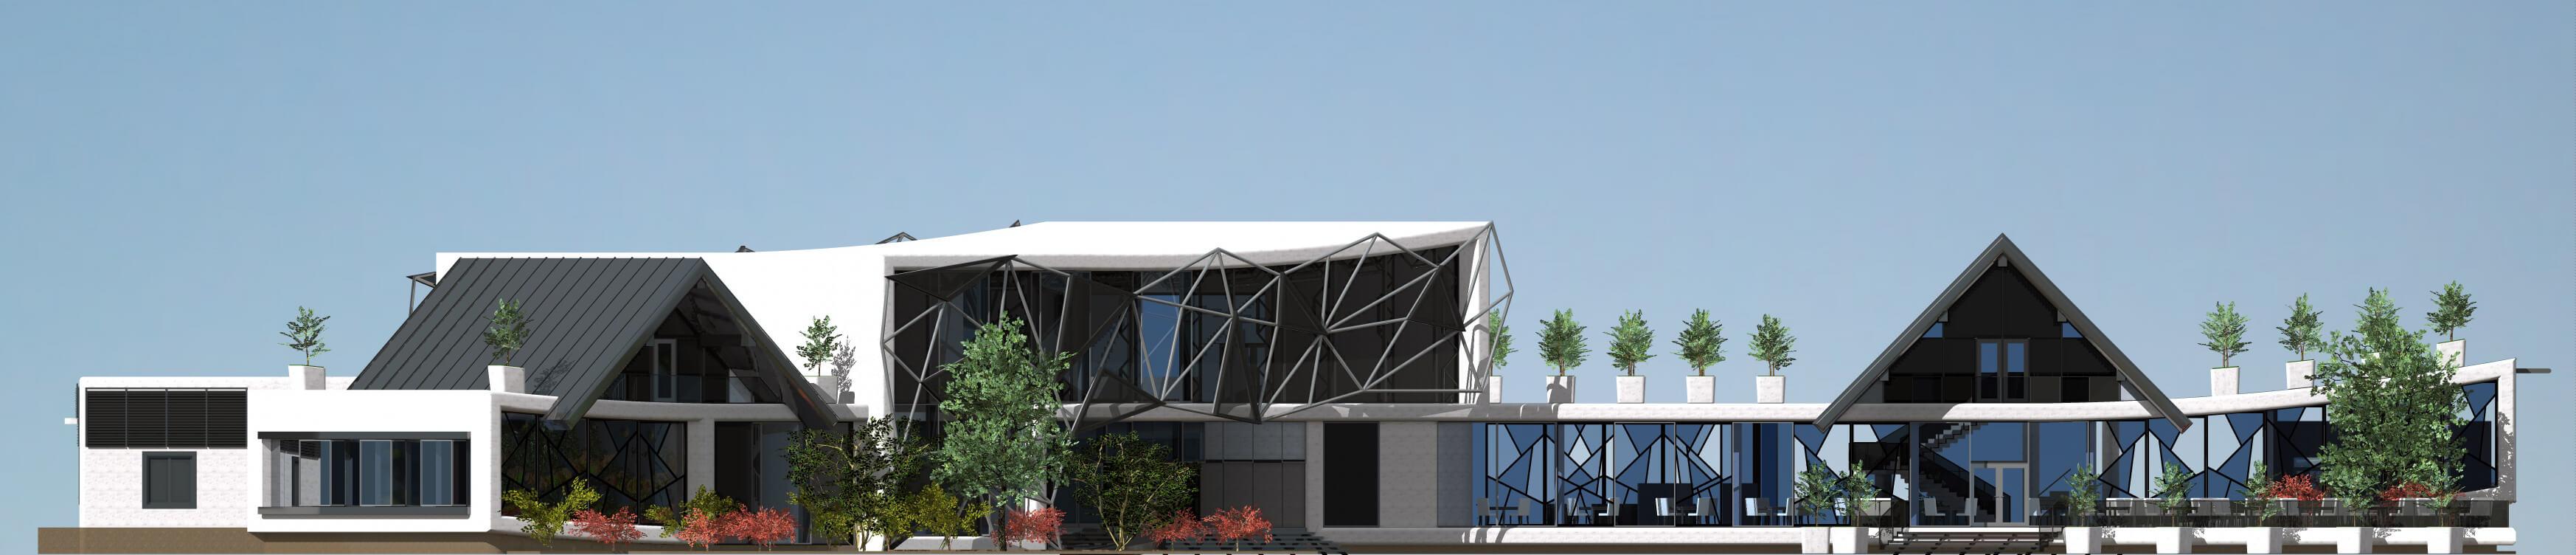 Каскад-Будинвест: проекты компании (изображение 32)